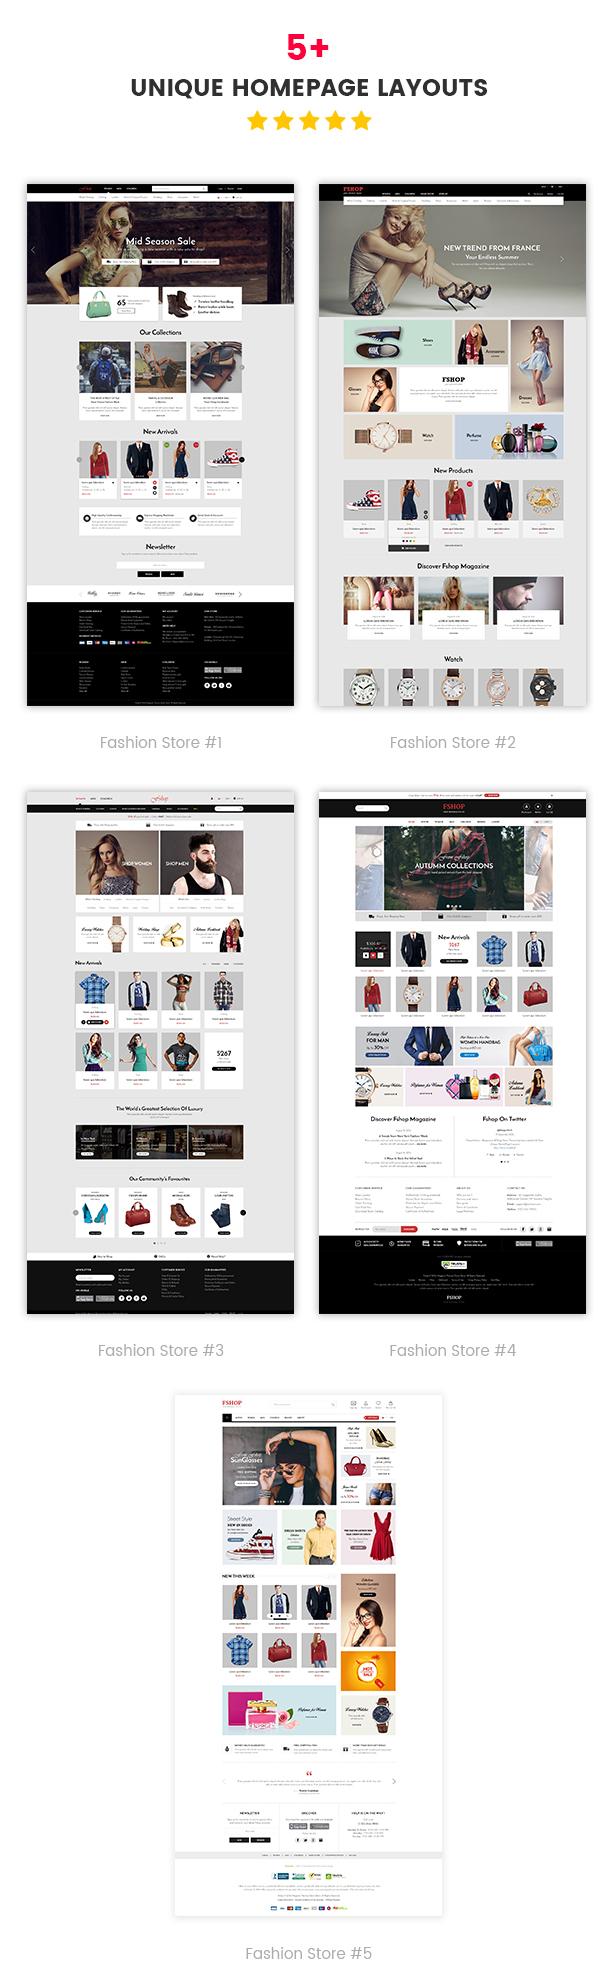 Fshop - Homepage